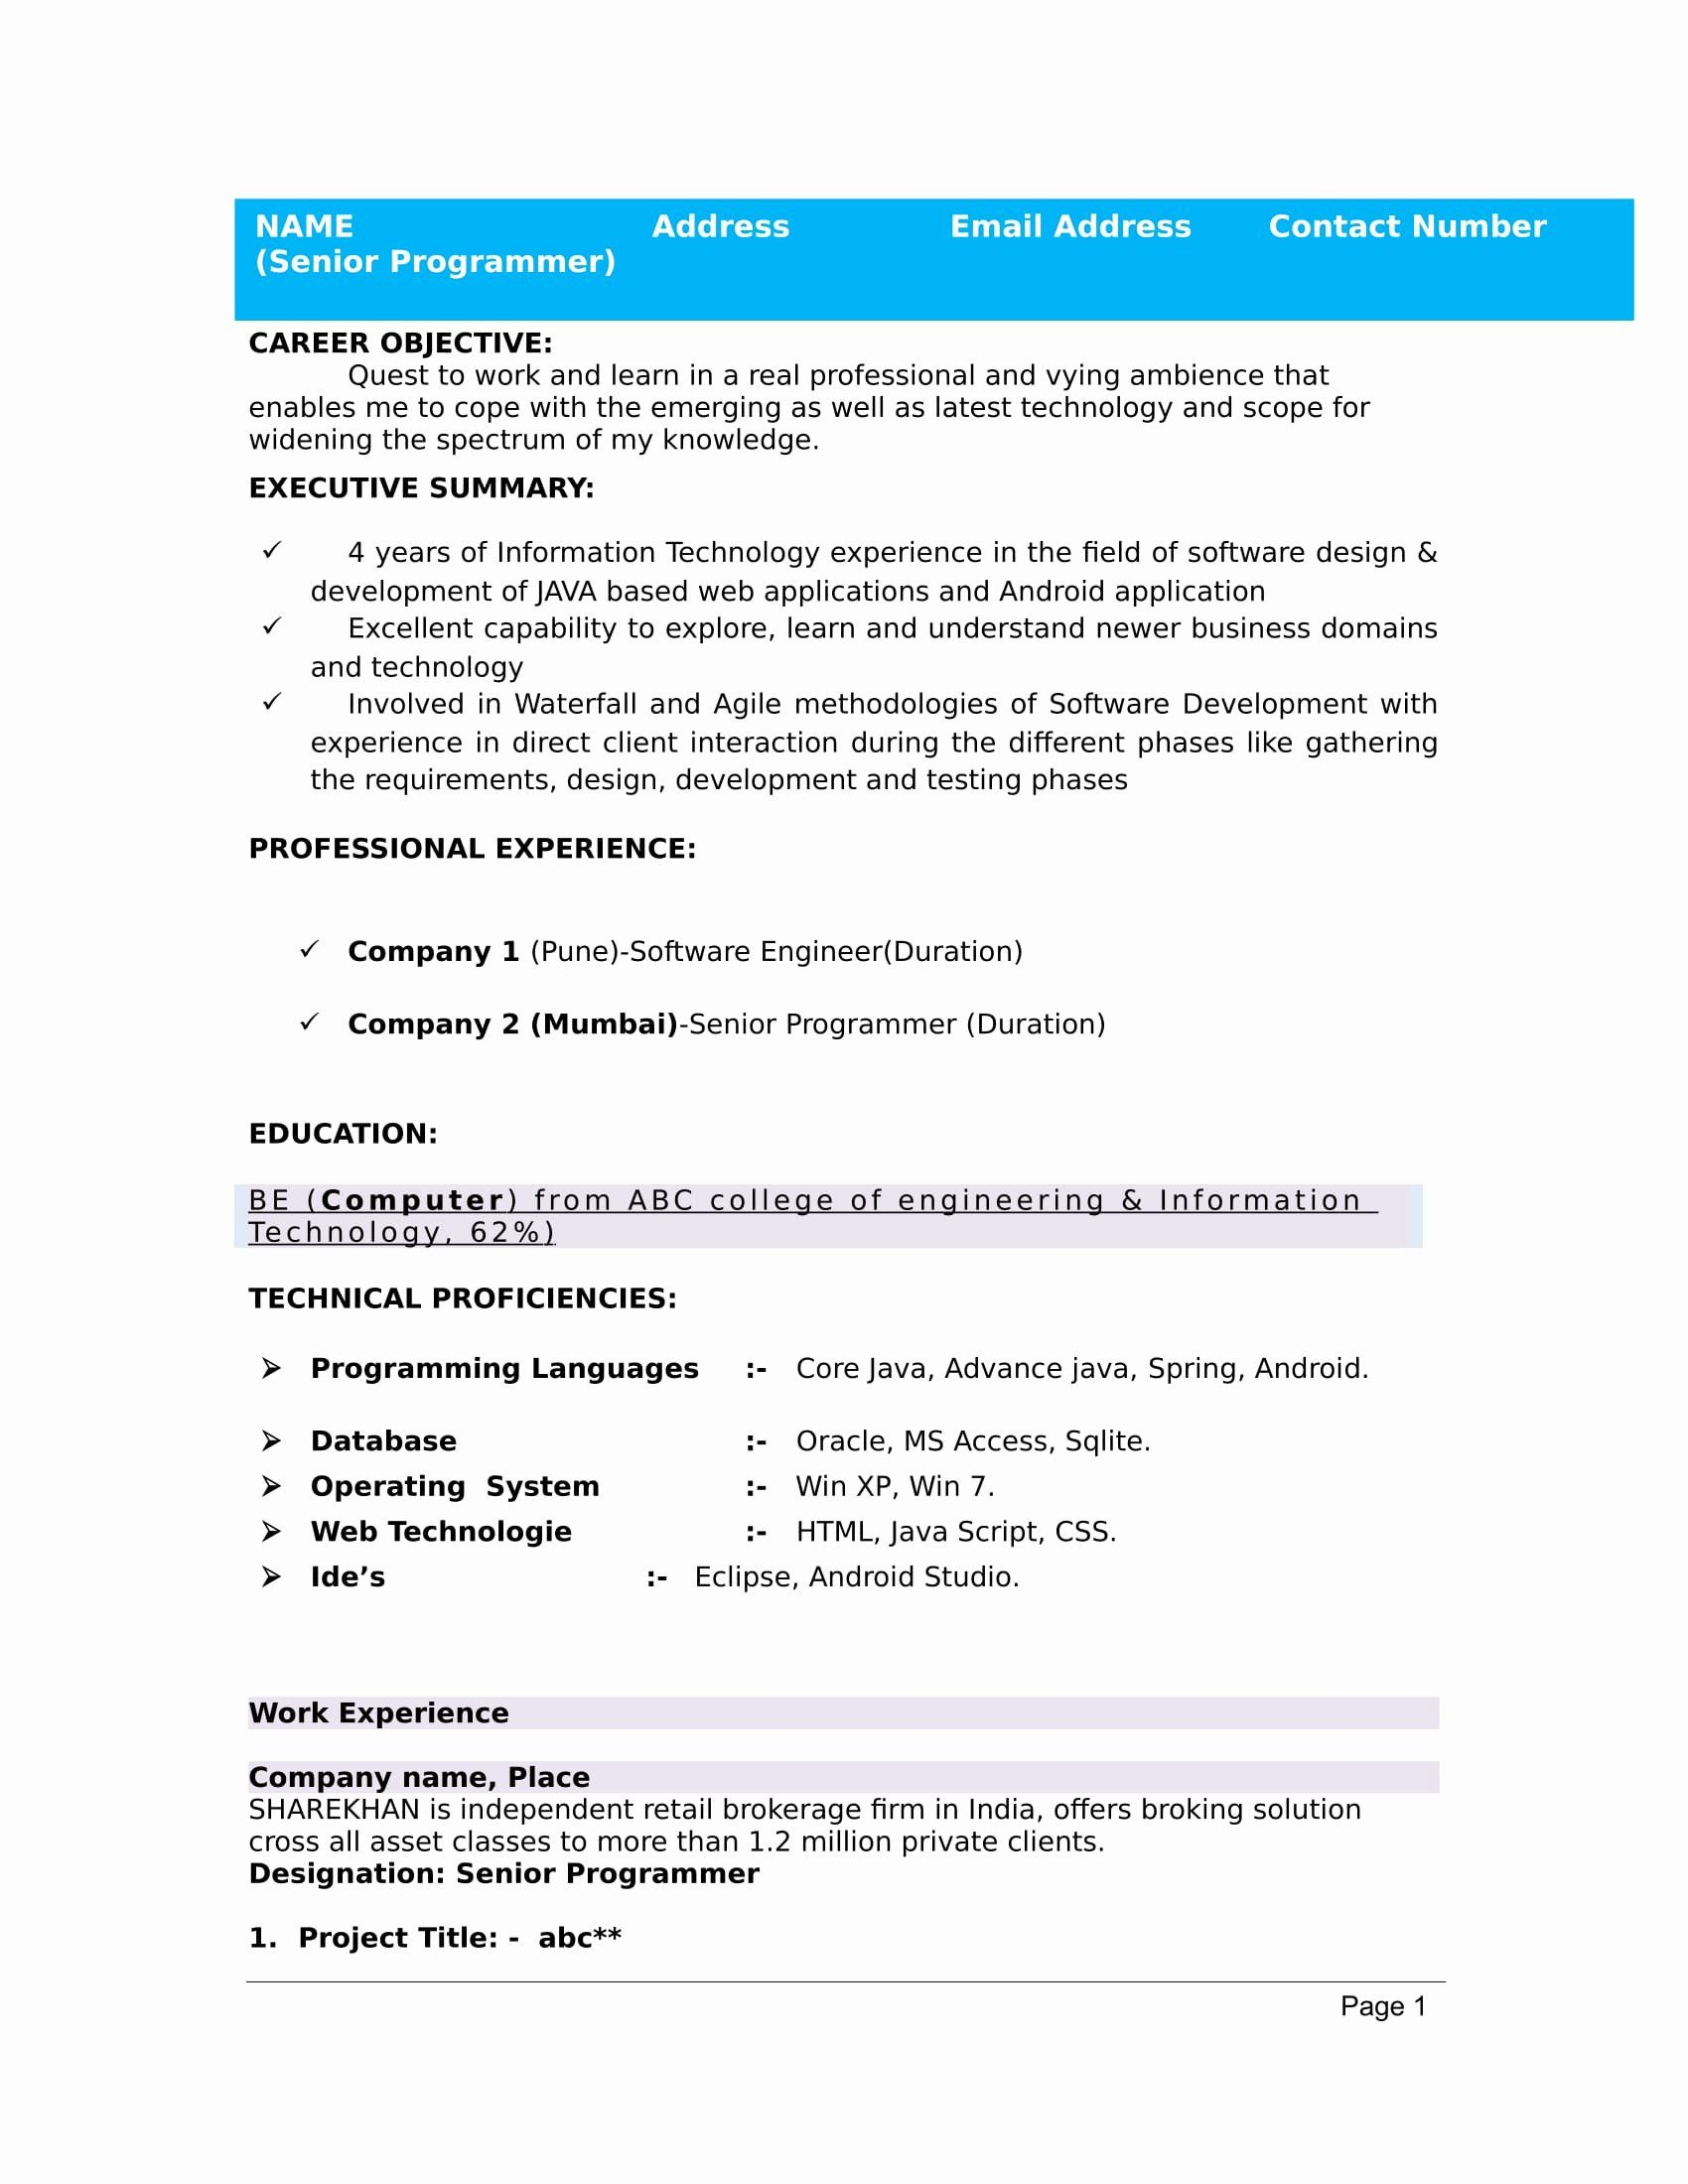 Resume Sample Format Pdf Download For Freshers